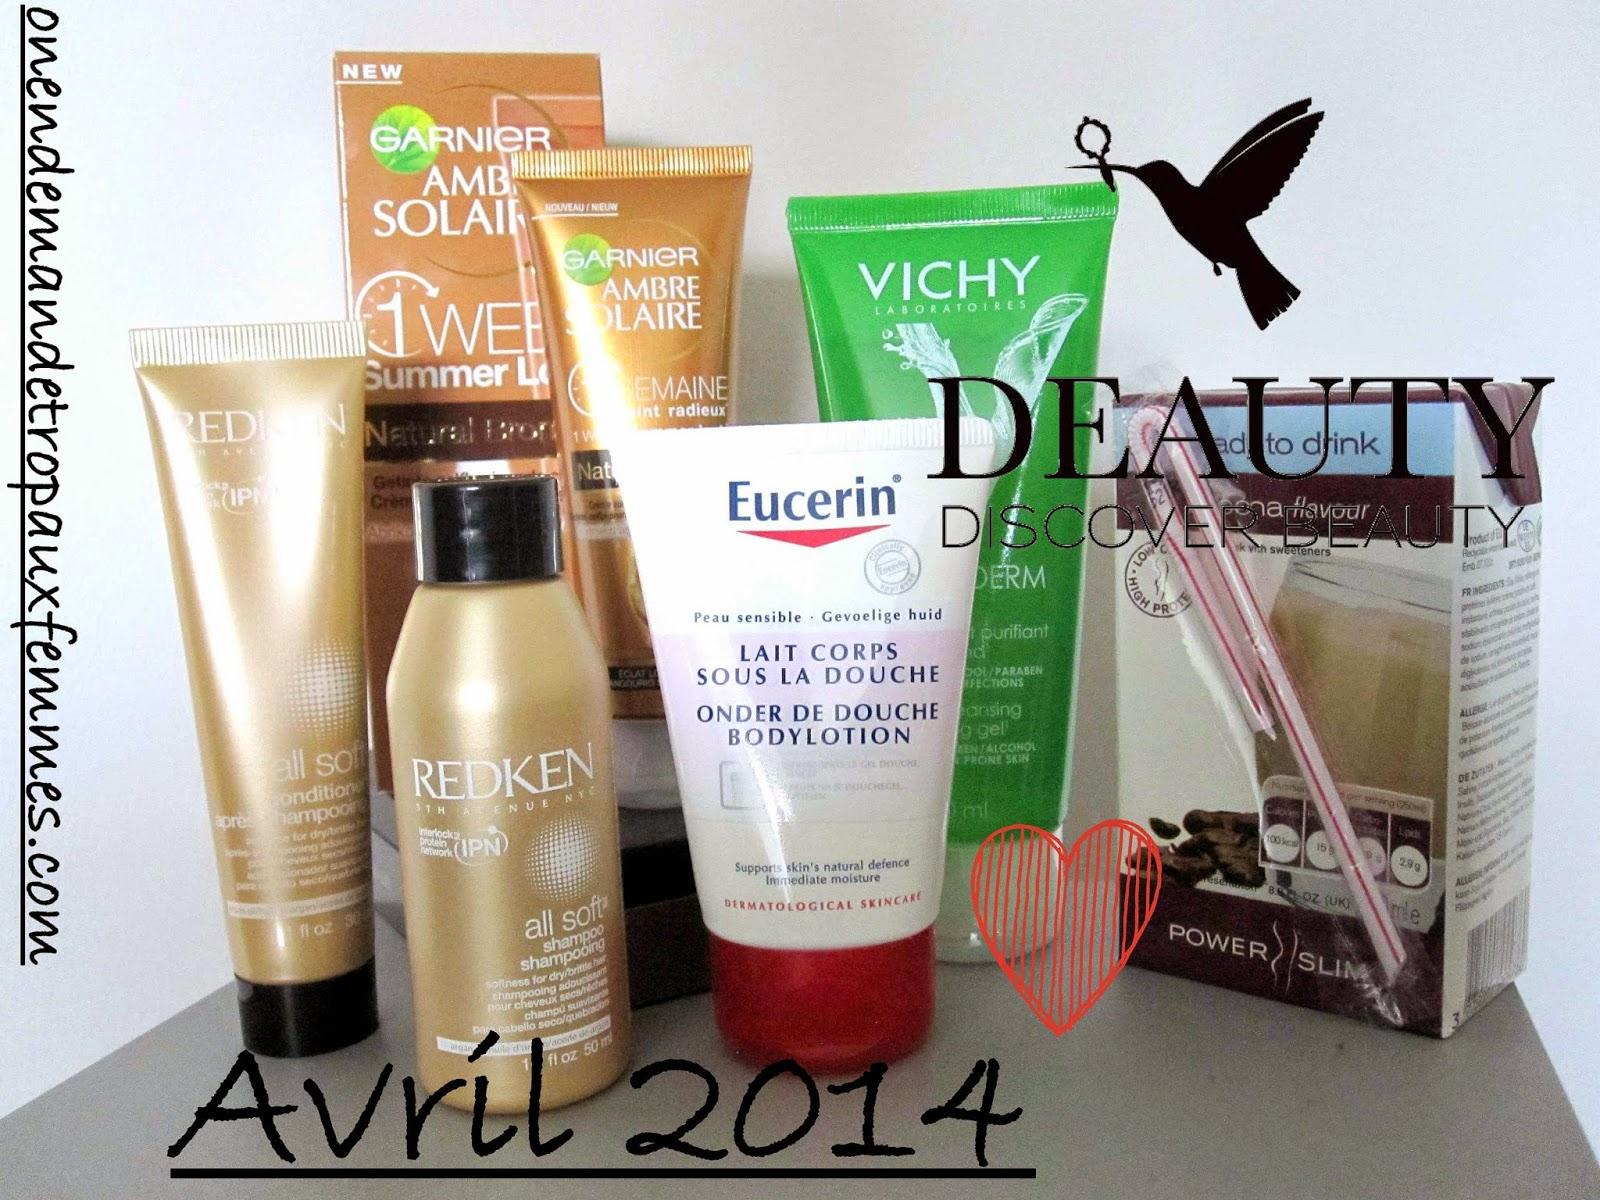 revue produits de la deauty box avril 2014